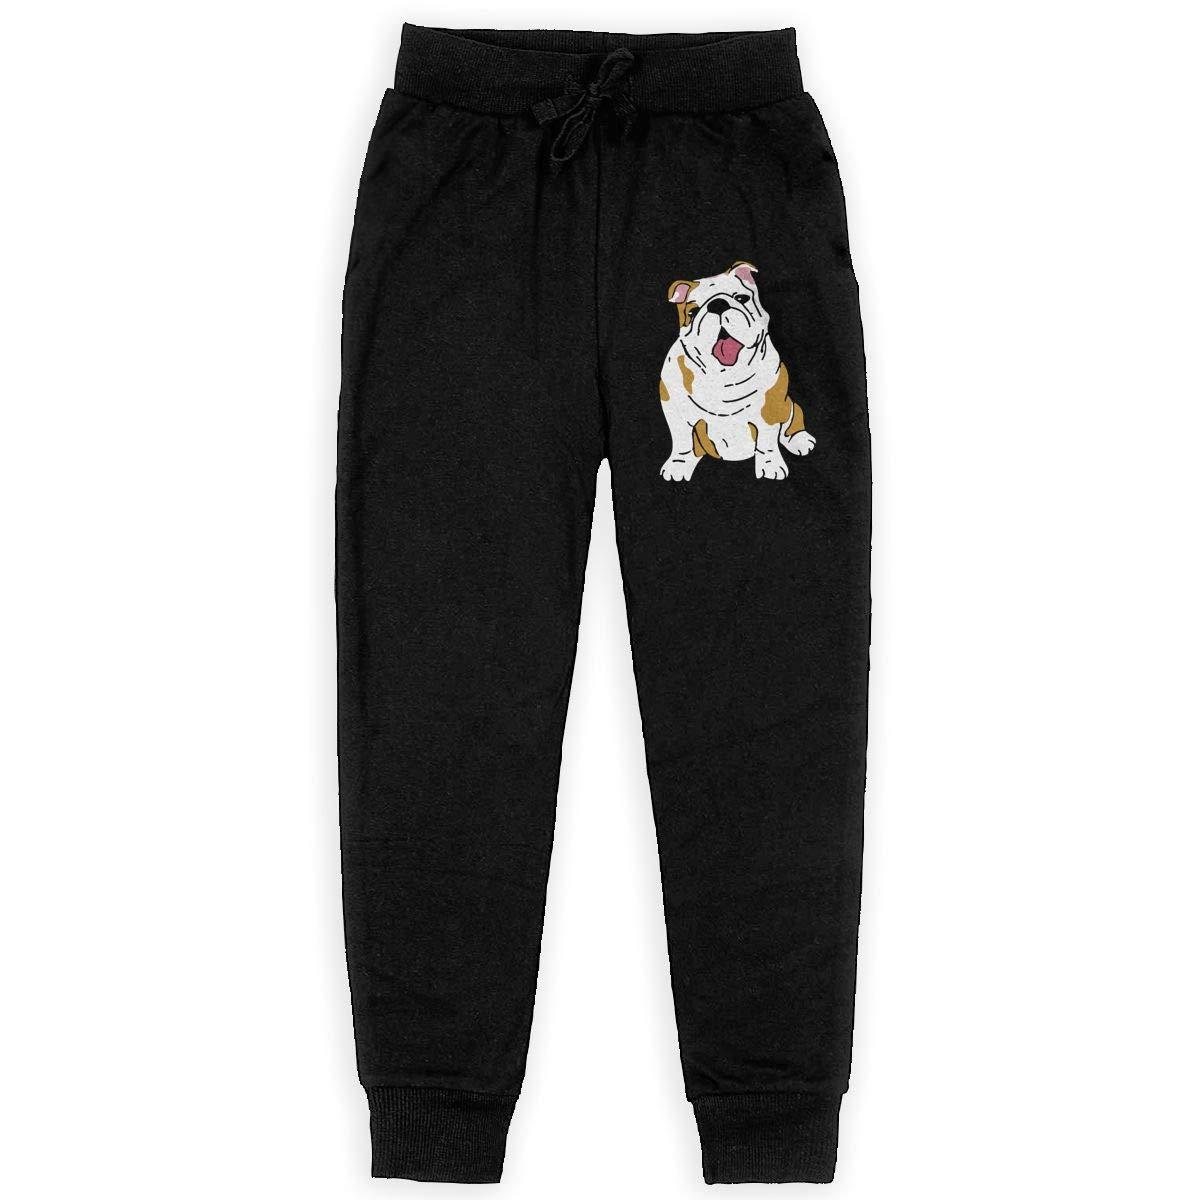 MAOYI/&J6 English Bulldog Long Sweatpants Juniors Boys Girls Jogger Trousers with Drawstring